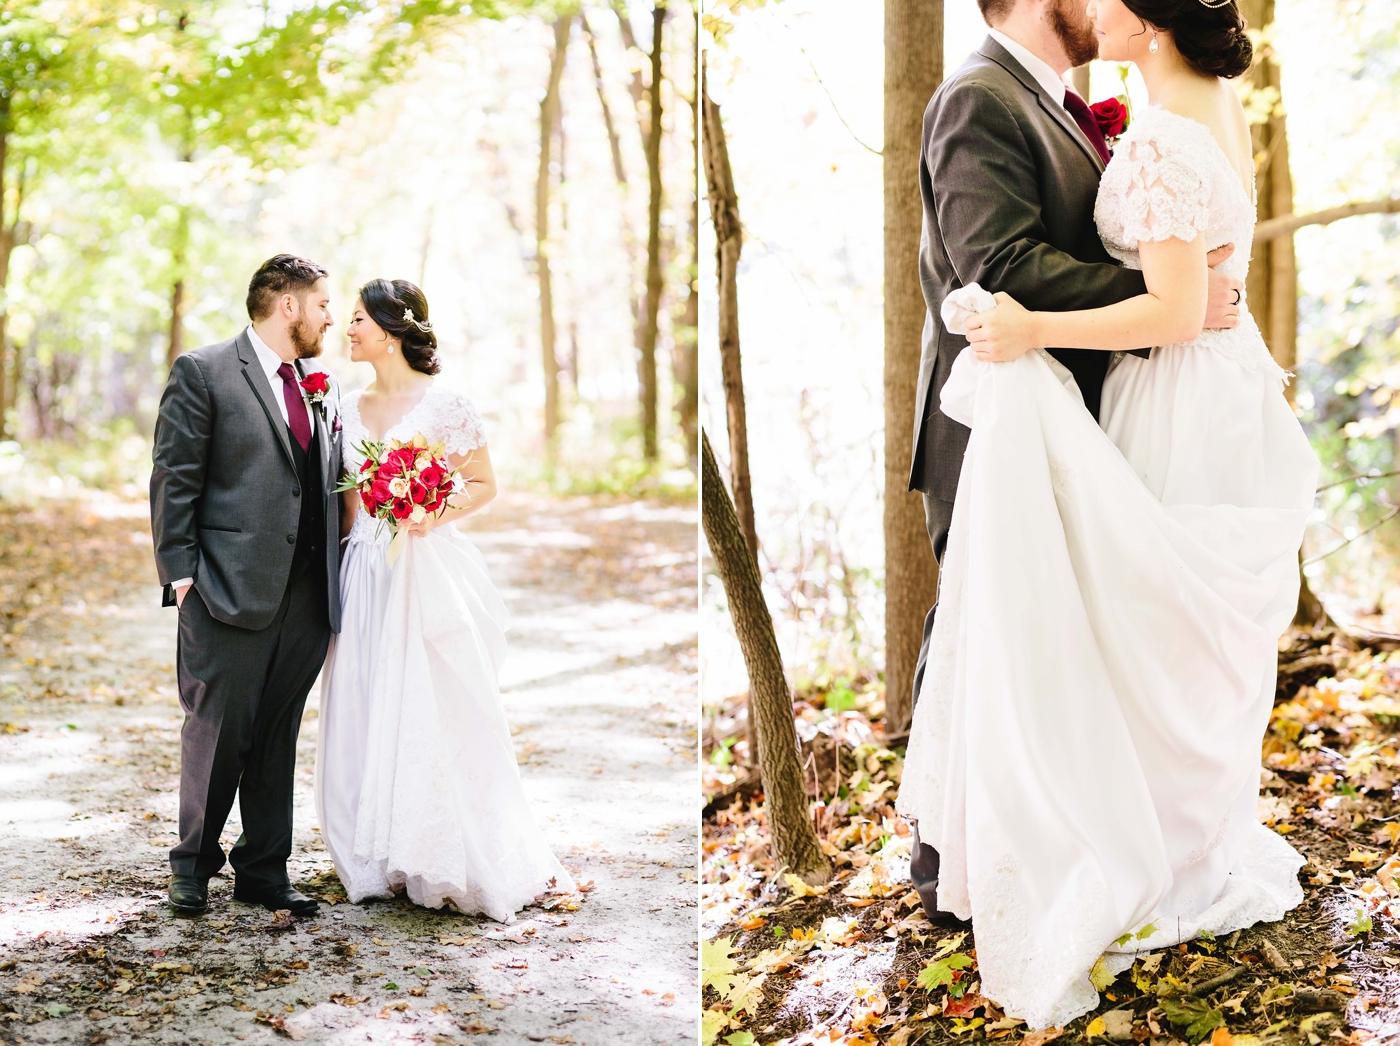 chicago-fine-art-wedding-photography-bolotin14